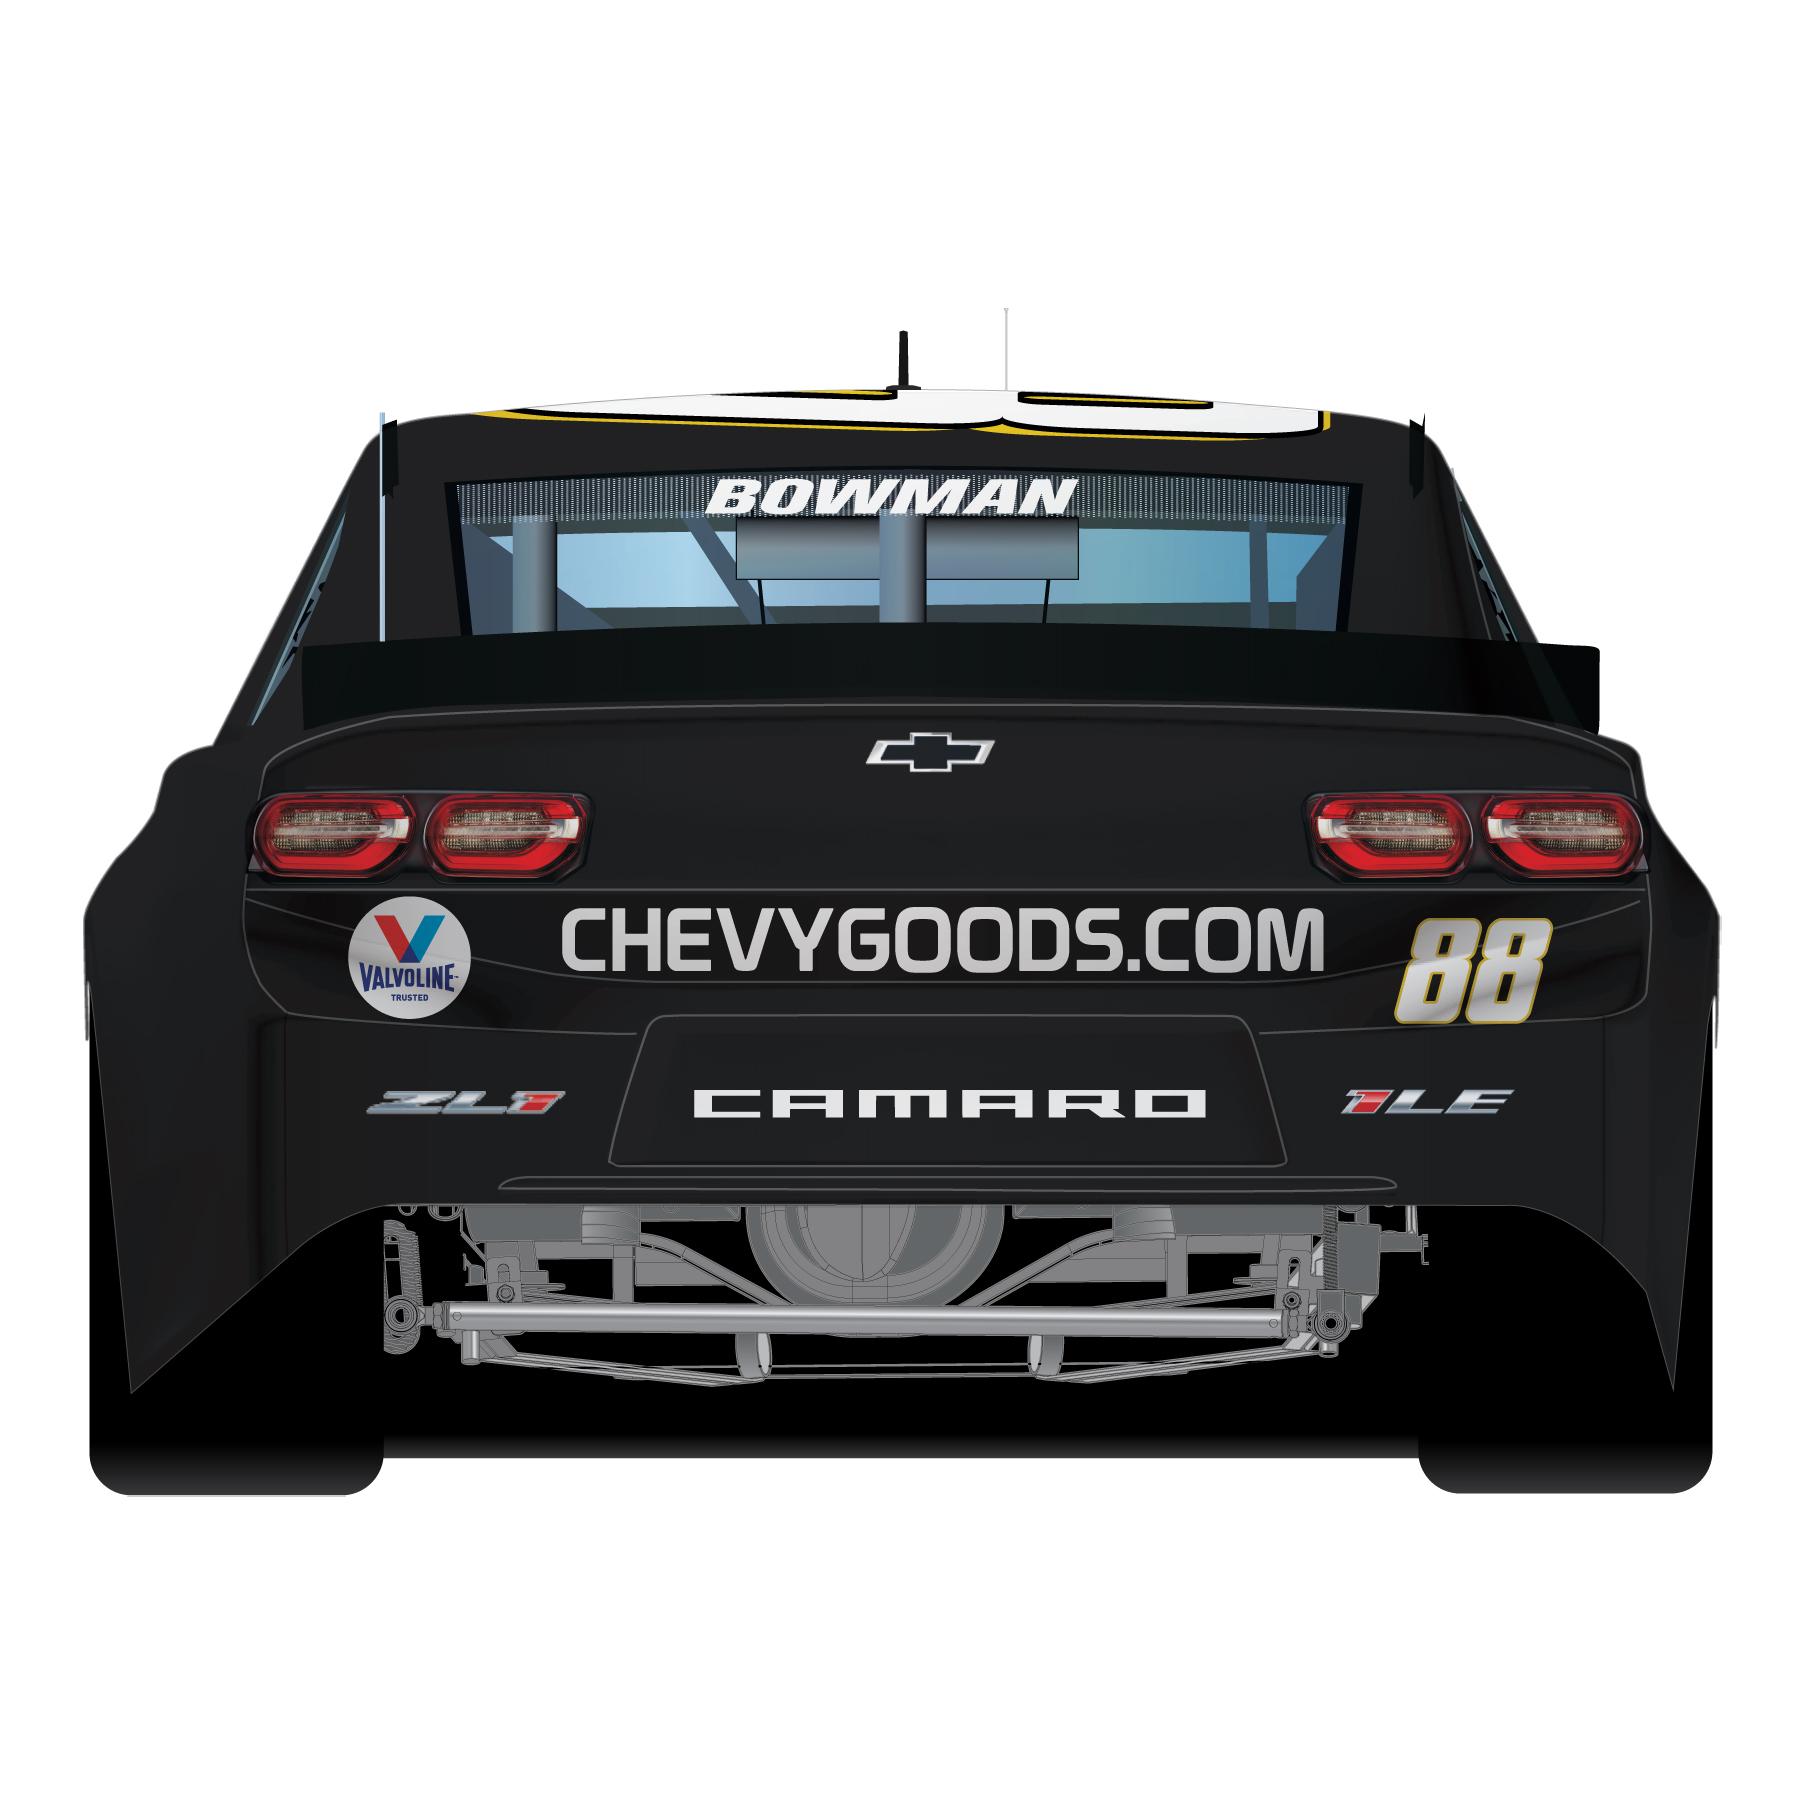 Alex Bowman #88 2020 NASCAR All-Star Race Chevy Goods Adams Polishes 1:64 Die-Cast